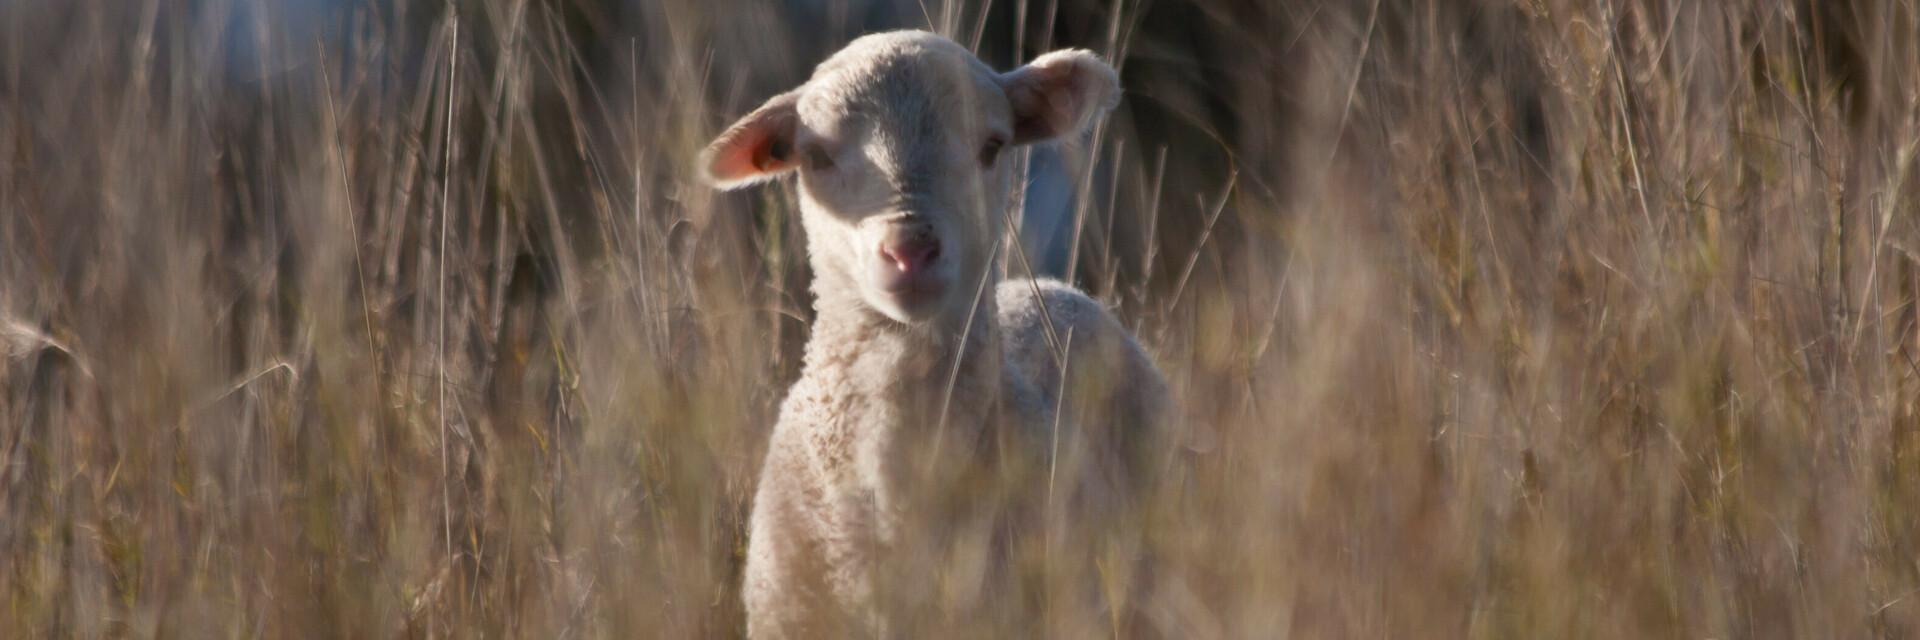 Lamb in Australia